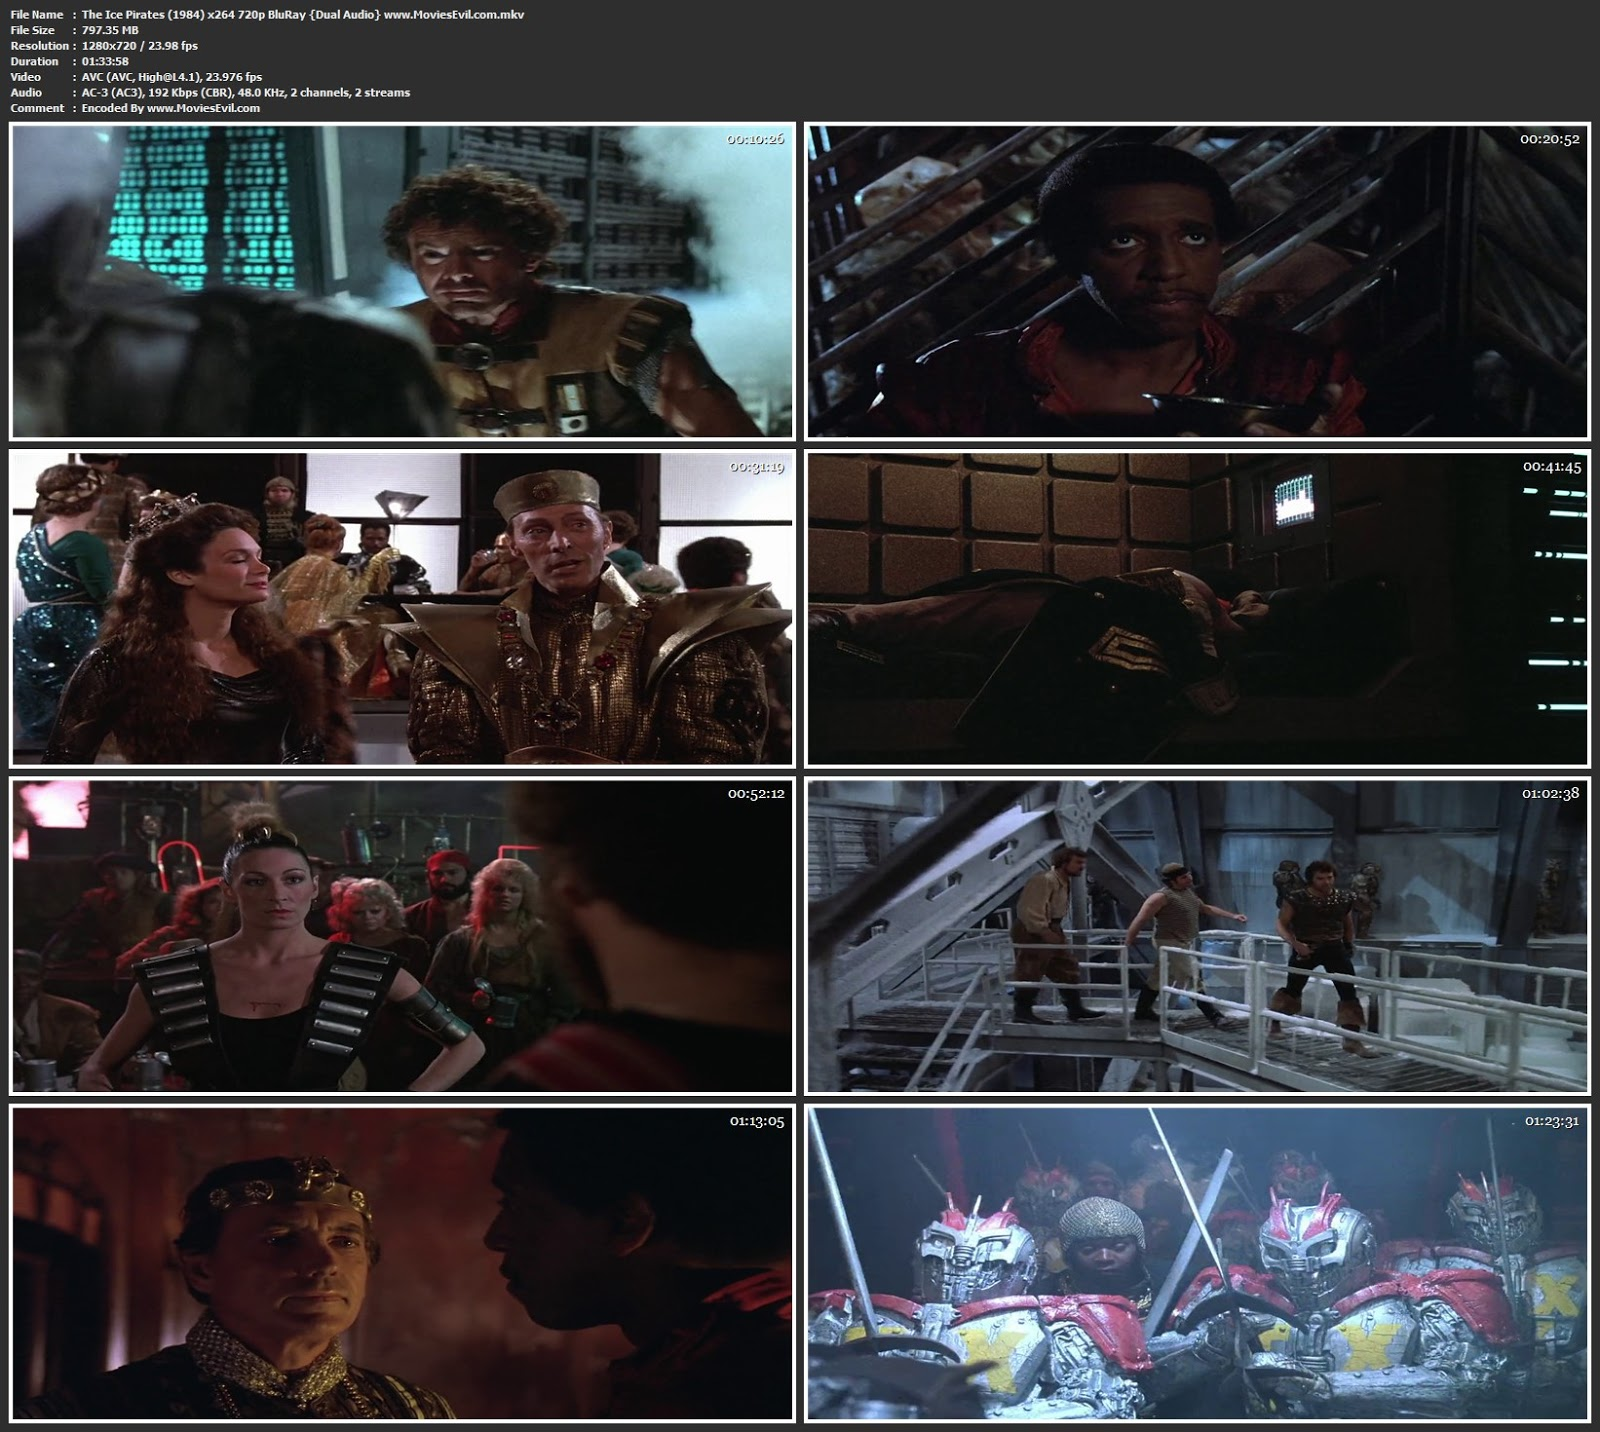 The Ice Pirates 1984 X264 720P Bluray Dual Audio Free -1328